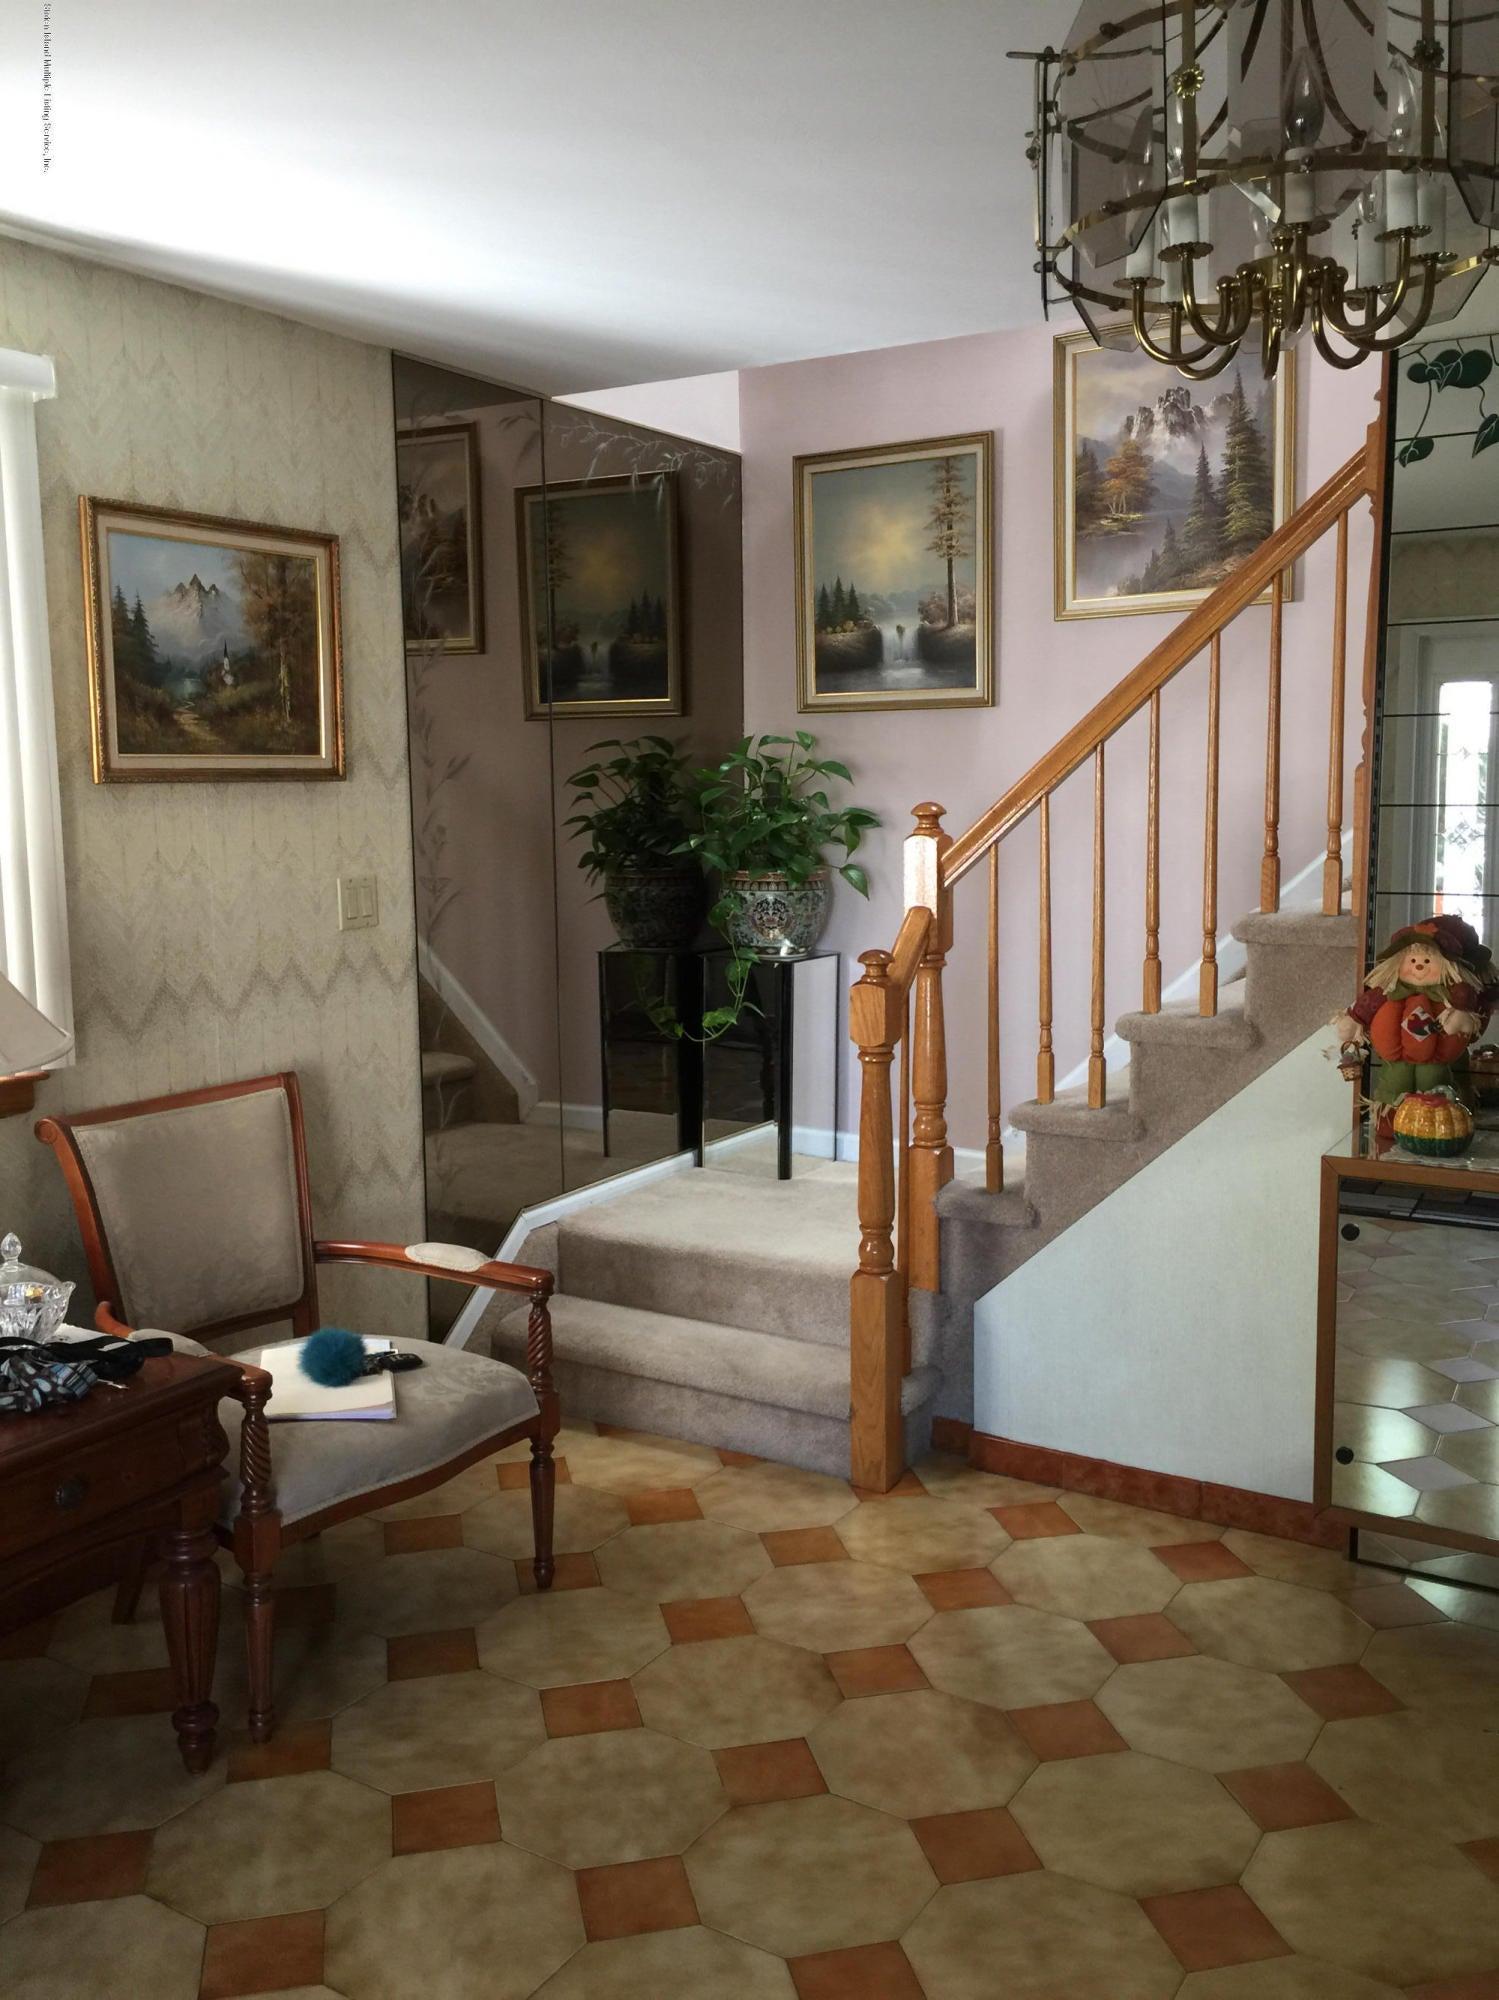 Single Family - Detached 108 Clarke Avenue  Staten Island, NY 10306, MLS-1106455-11